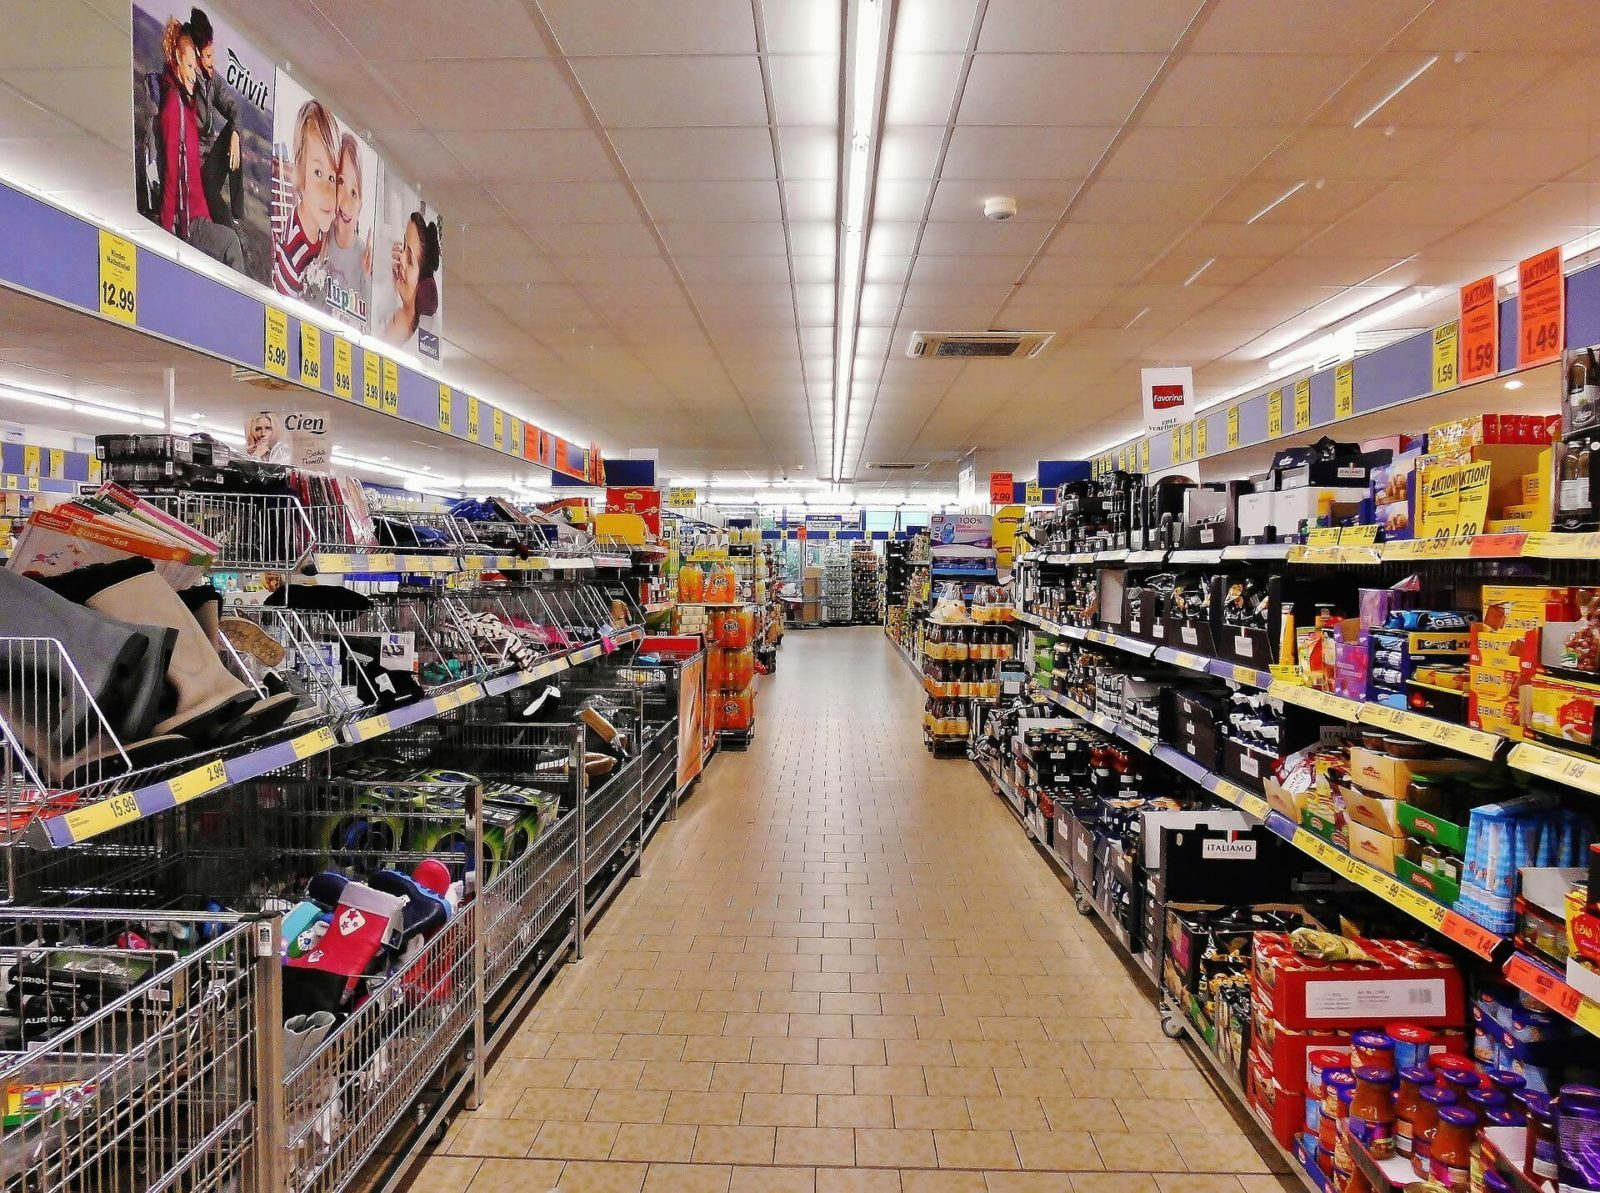 Sirope-Historias-lanzar-producto-target-habitat